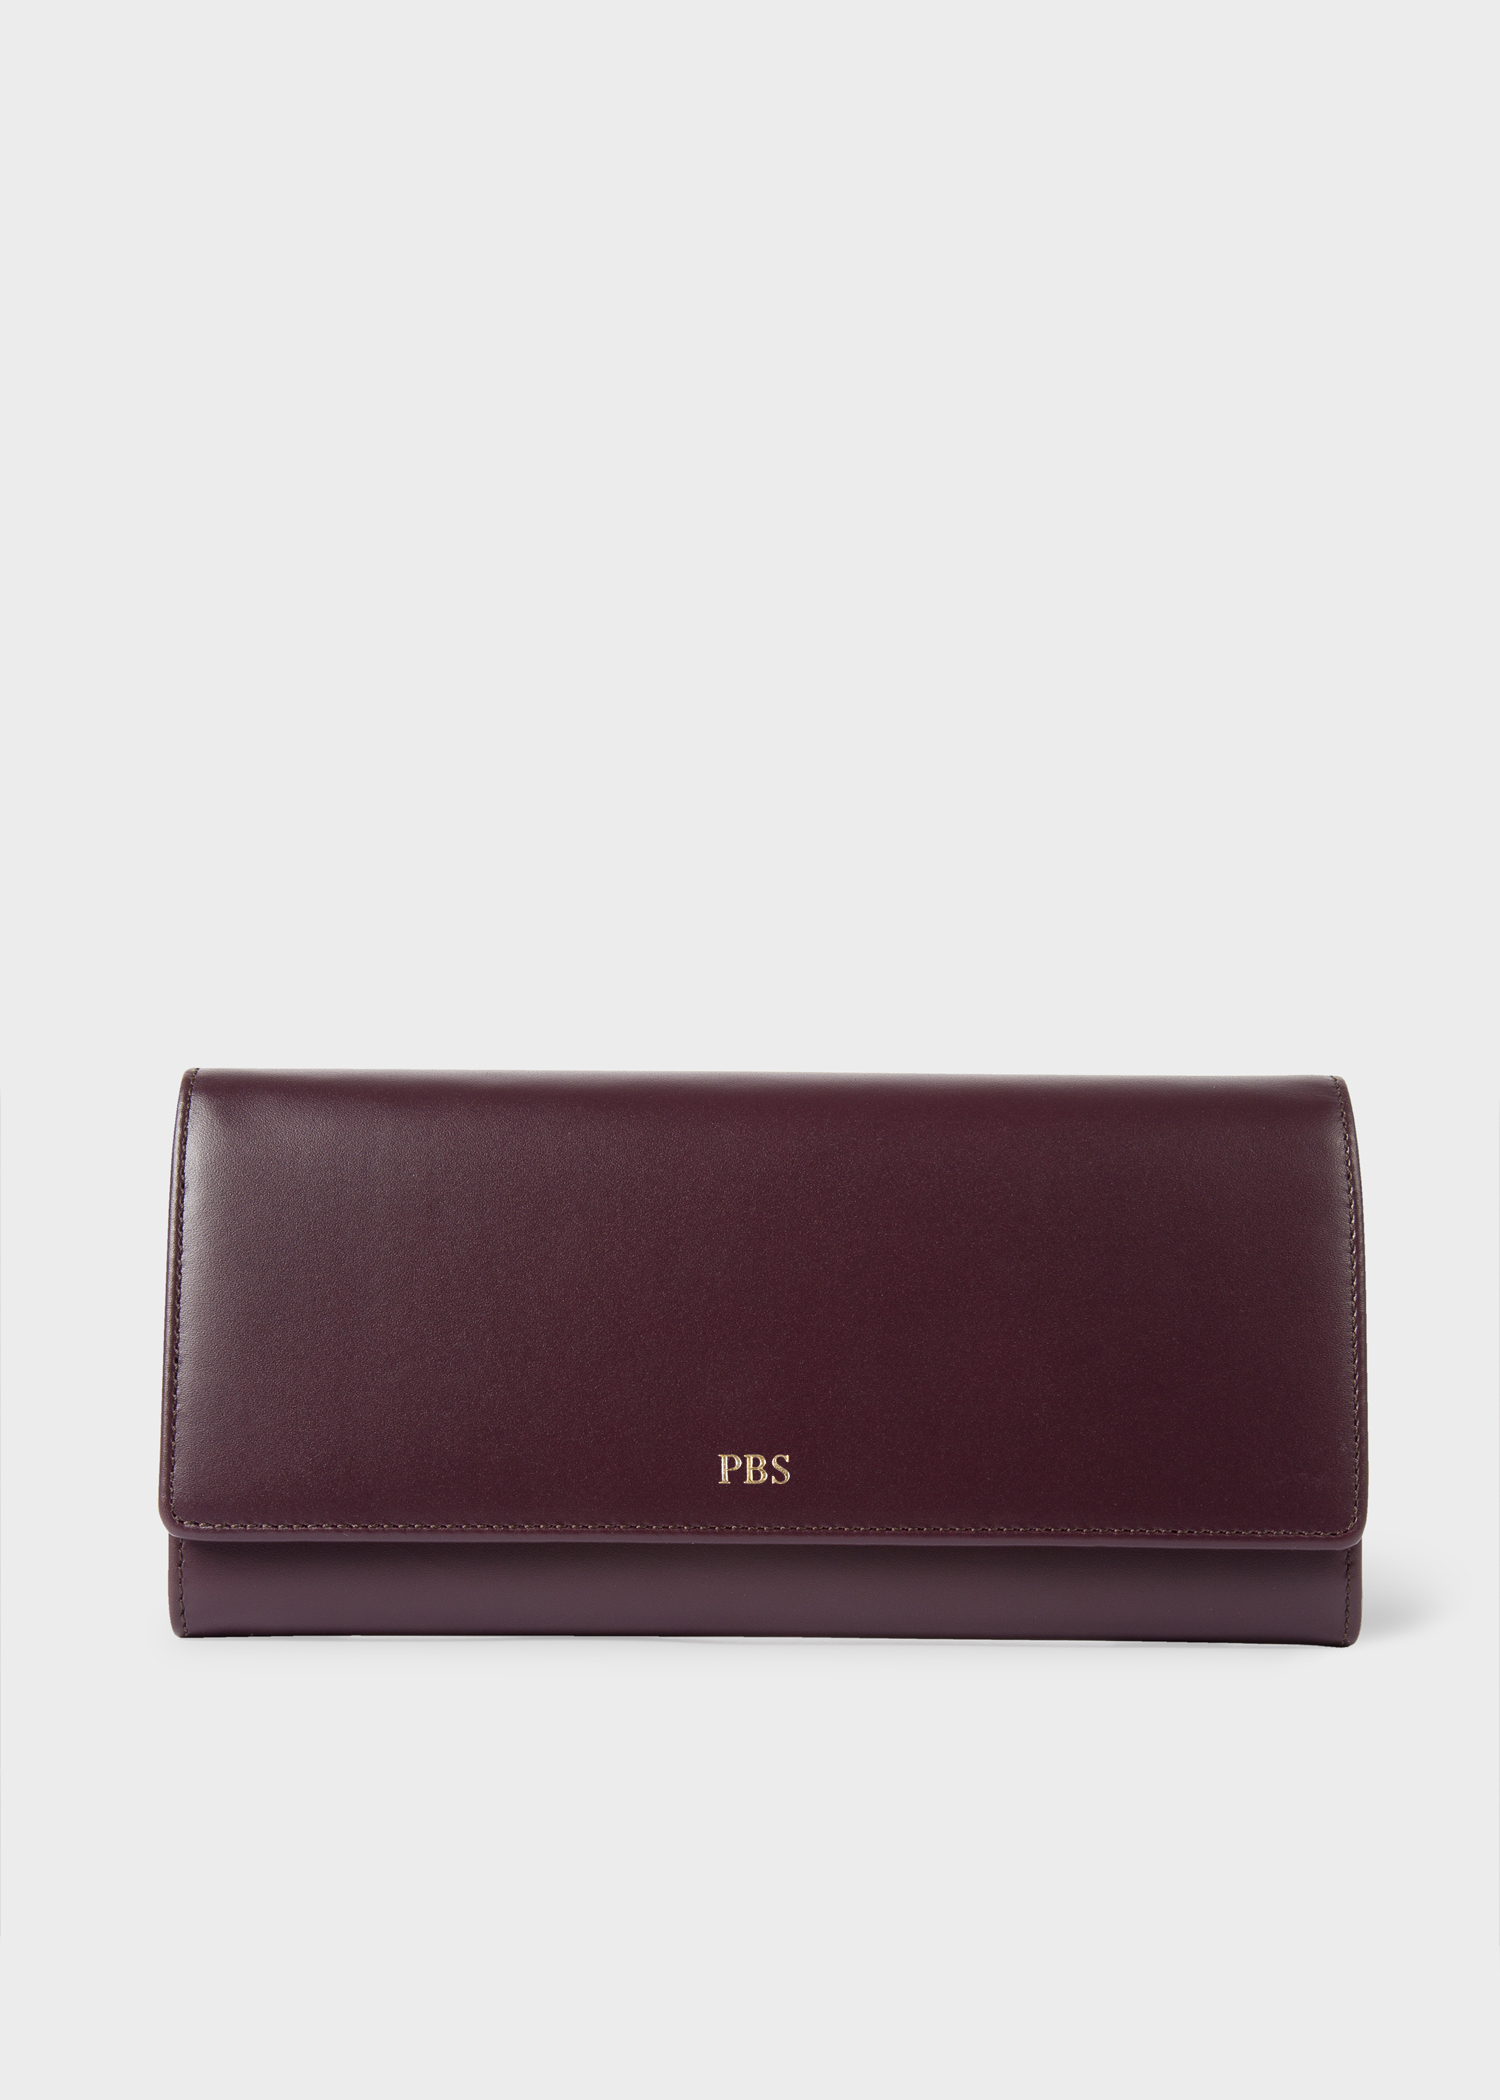 Women s Damson Leather Monogrammed Tri-Fold Purse - Paul Smith Asia 1e43ef41955f